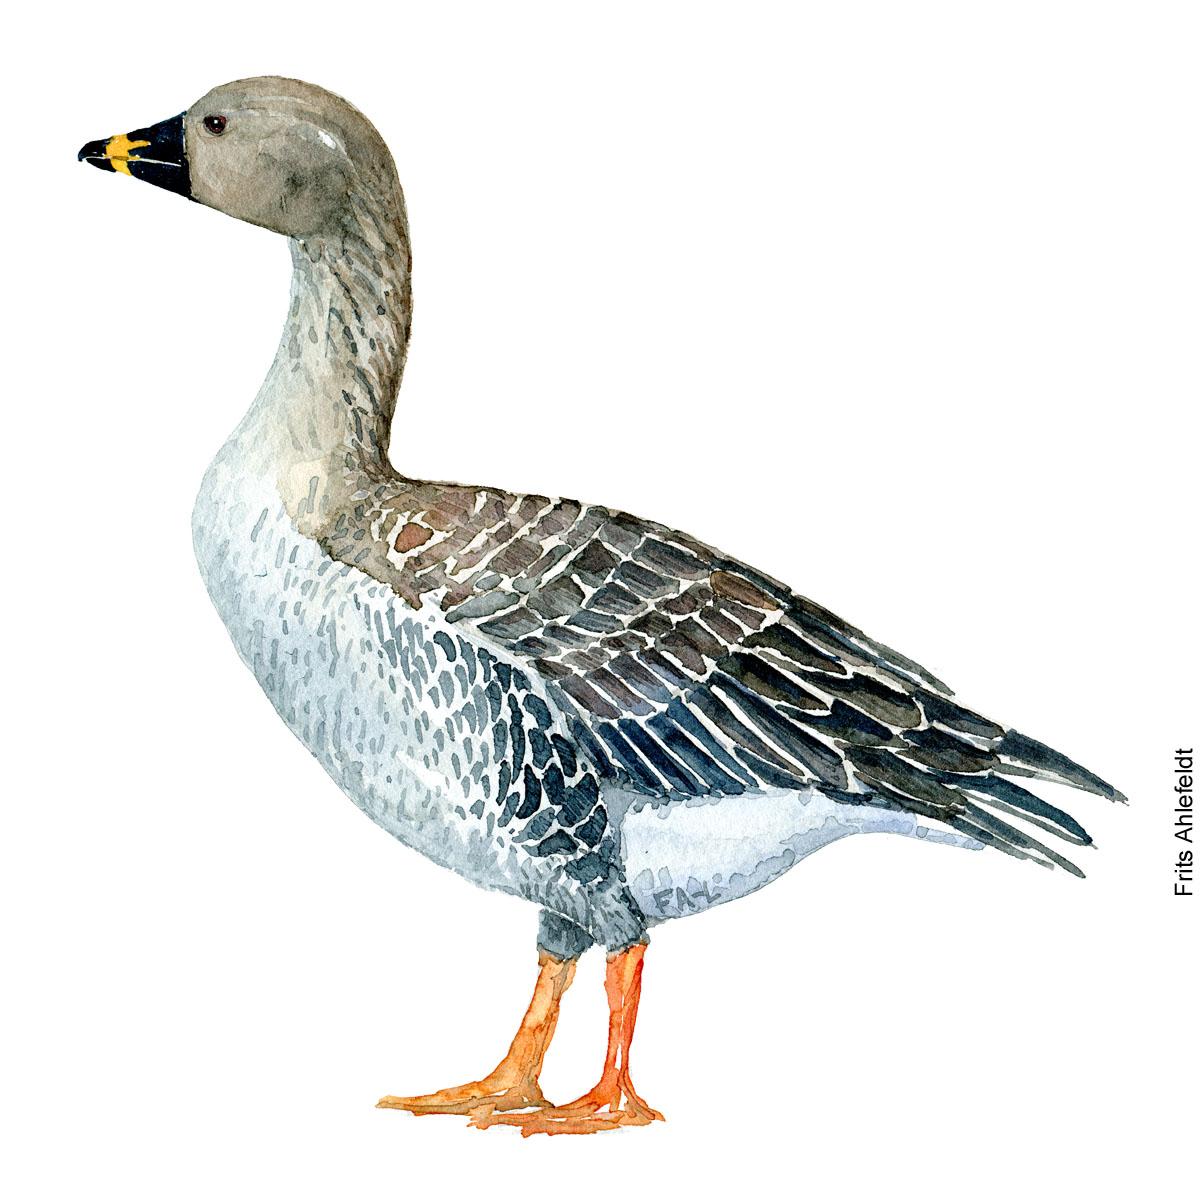 saedgaas - Bean-goose Bird watercolor. Fugle akvarel af Frits Ahlefeldt